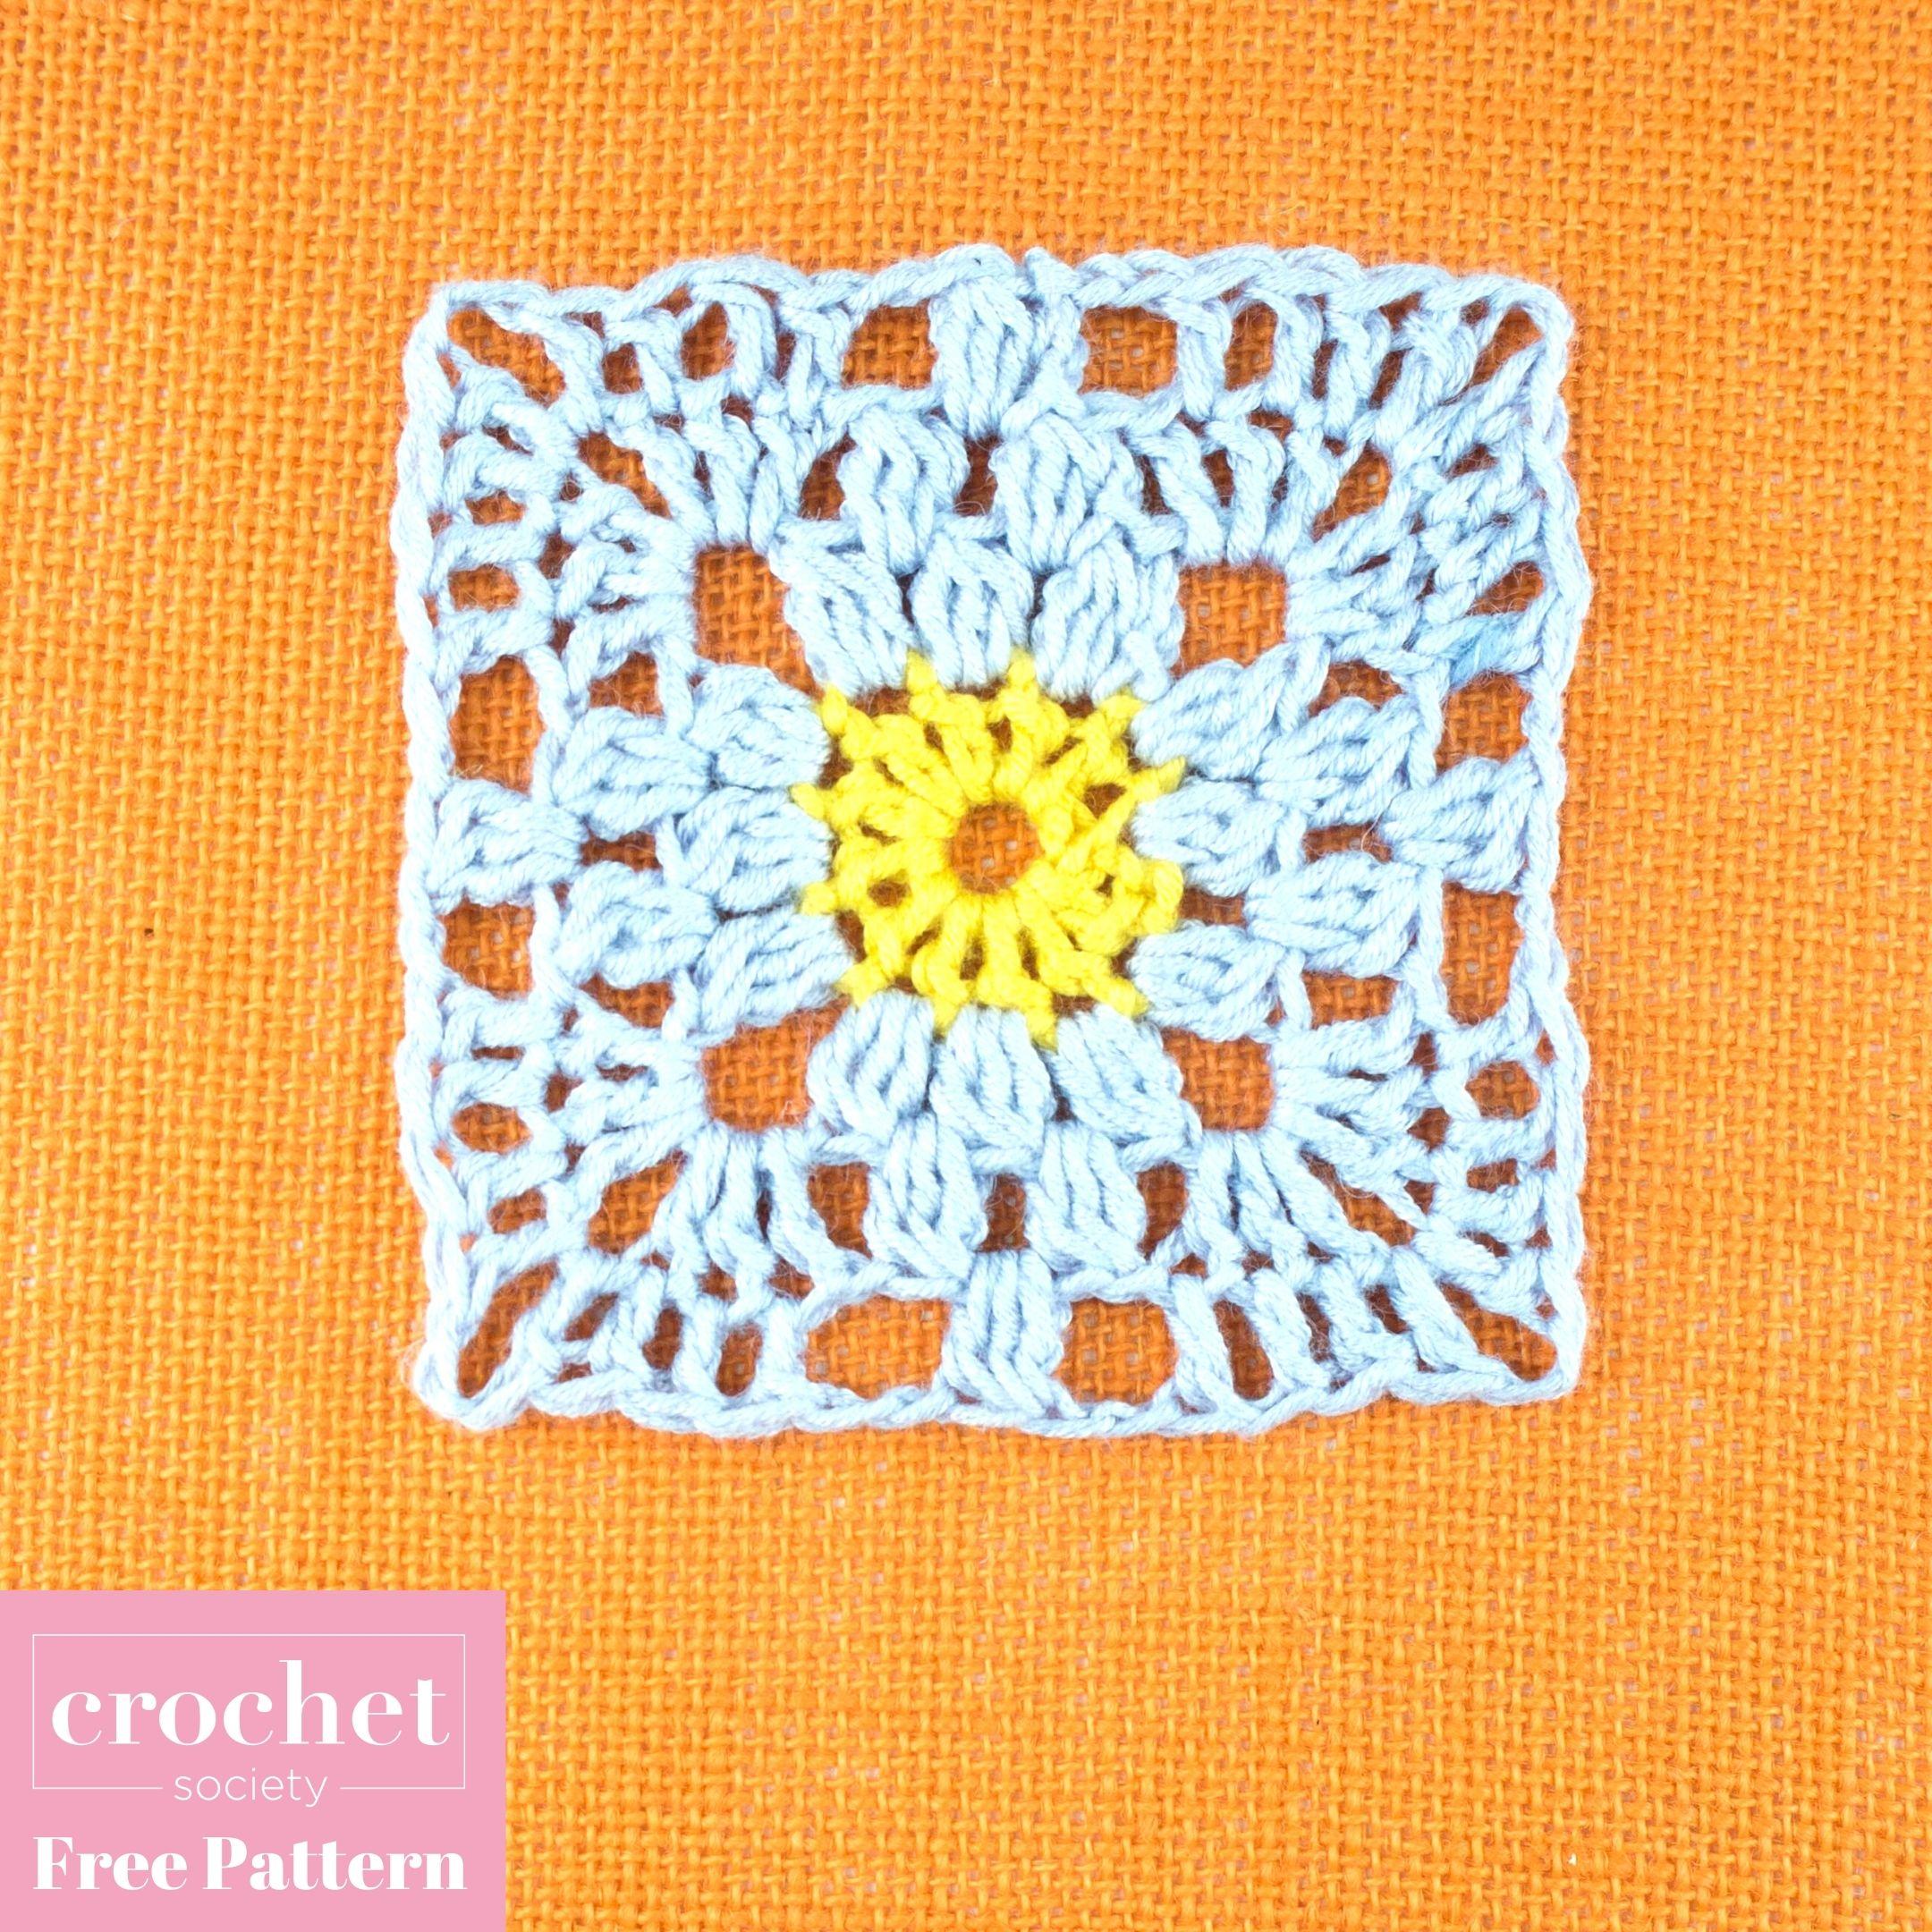 FREE crochet pattern: floral granny square